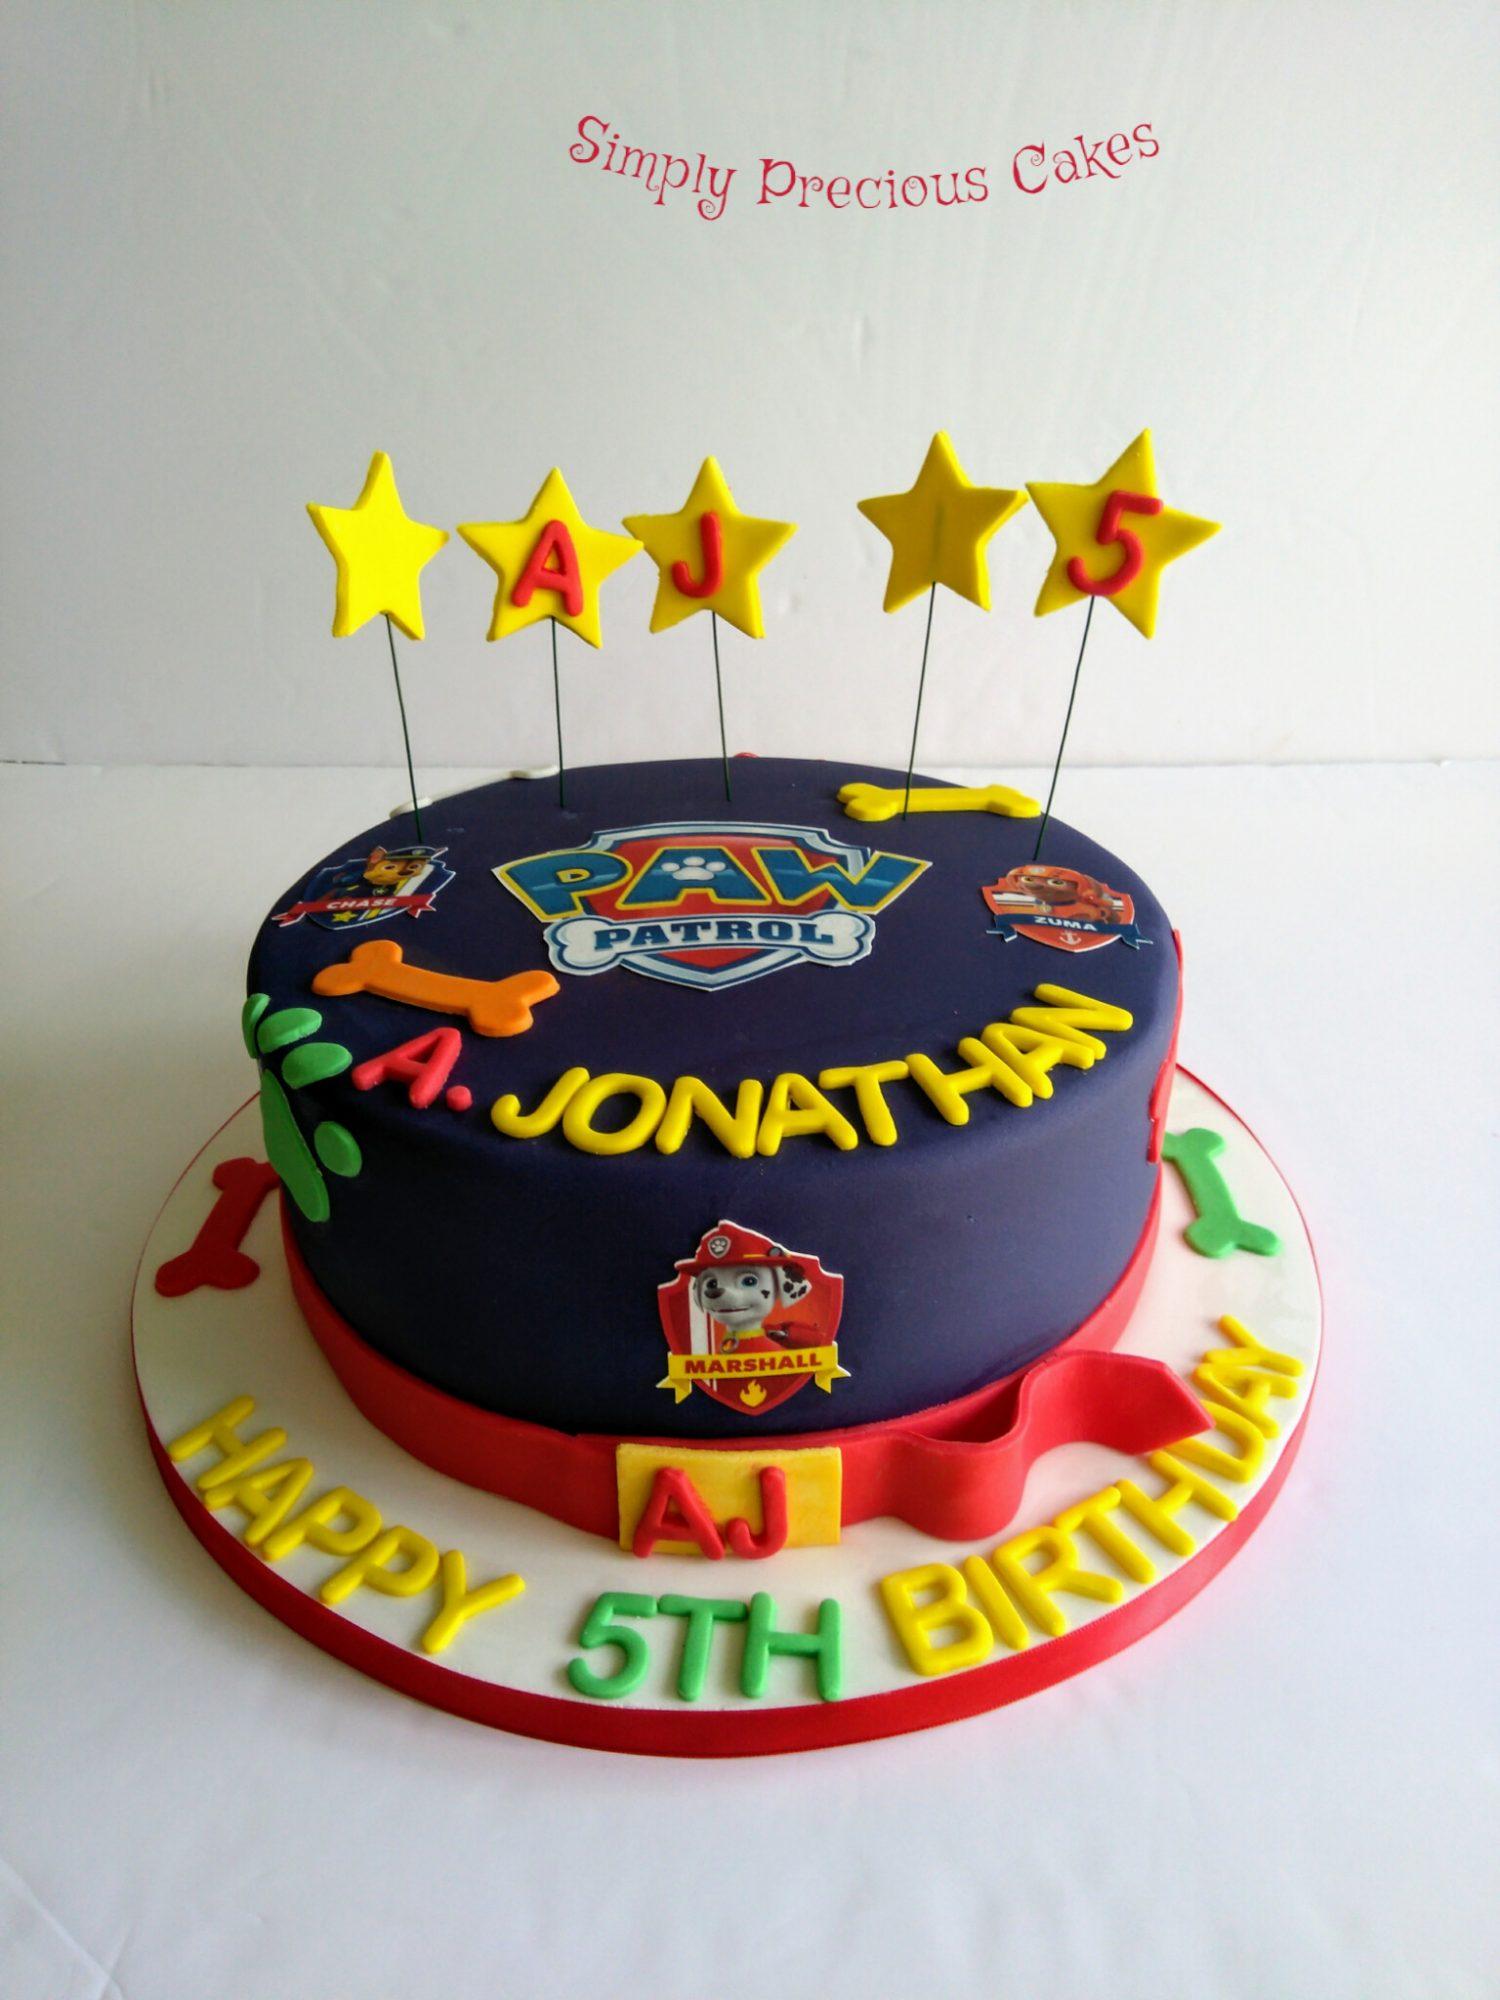 Fabulous Childrens Birthday Cakes Simply Precious Cakes Funny Birthday Cards Online Aboleapandamsfinfo